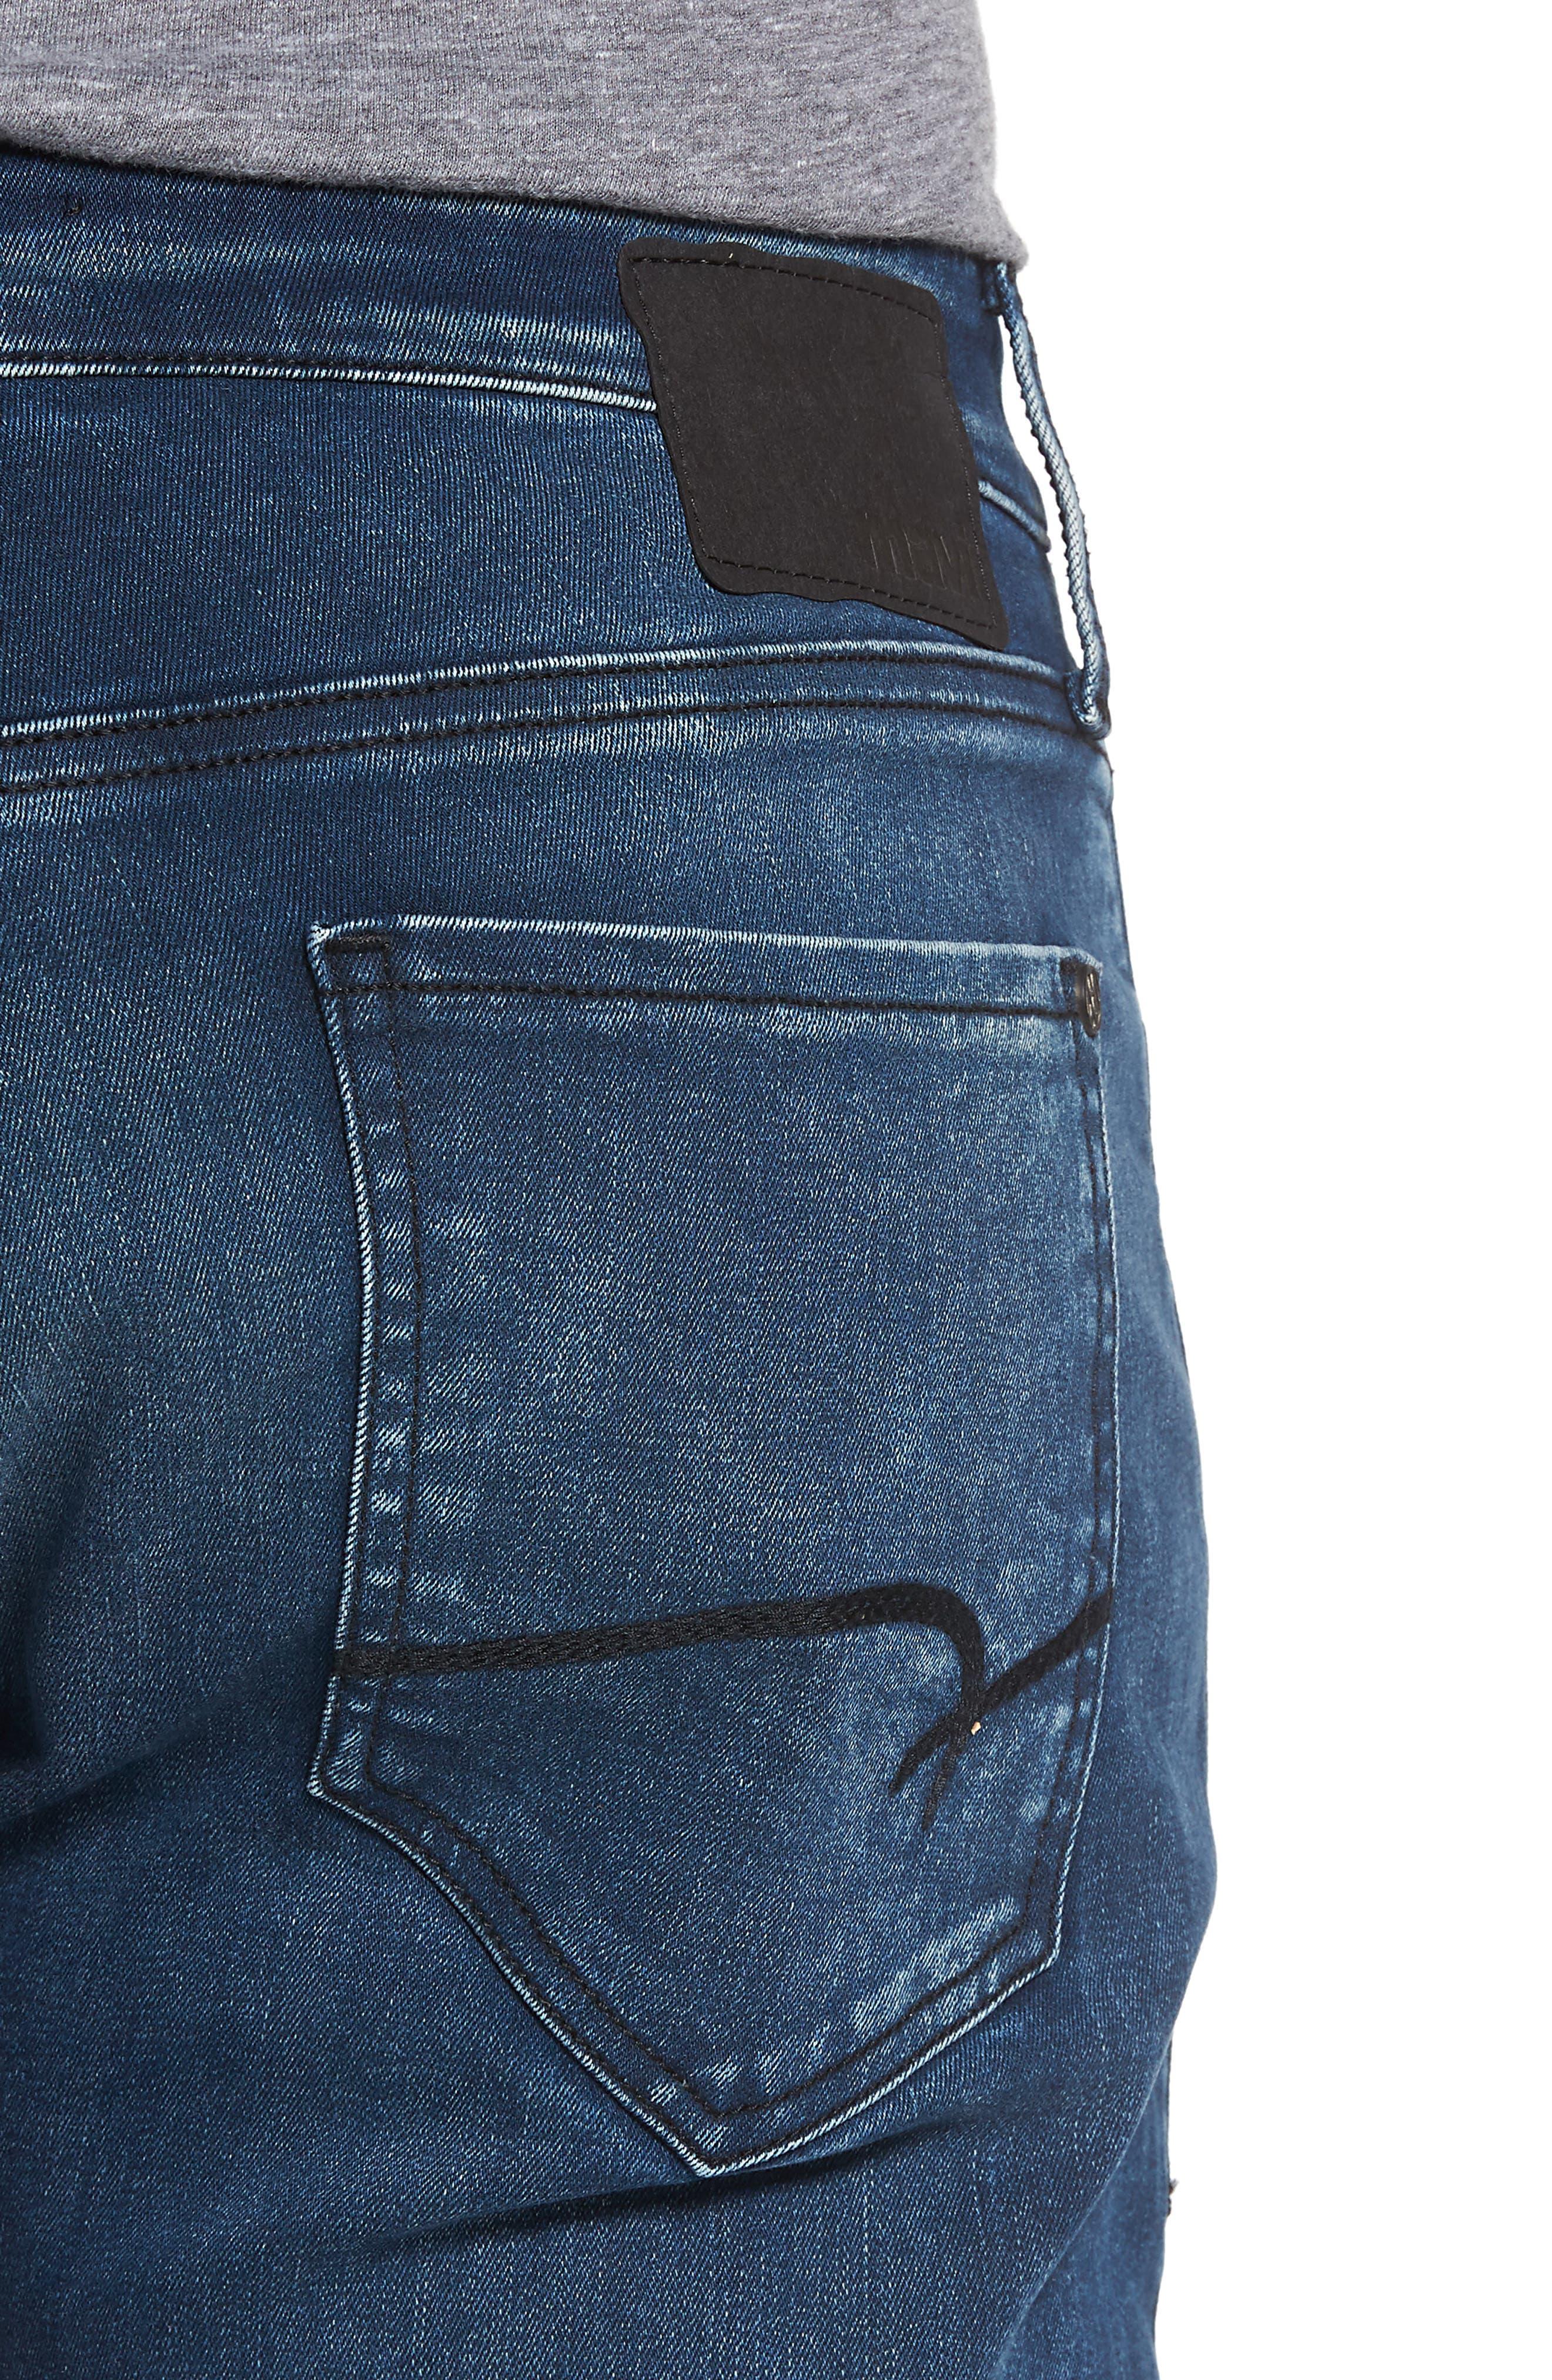 Marcus Slim Straight Leg Jeans,                             Alternate thumbnail 4, color,                             Forest Blue Williamsburg